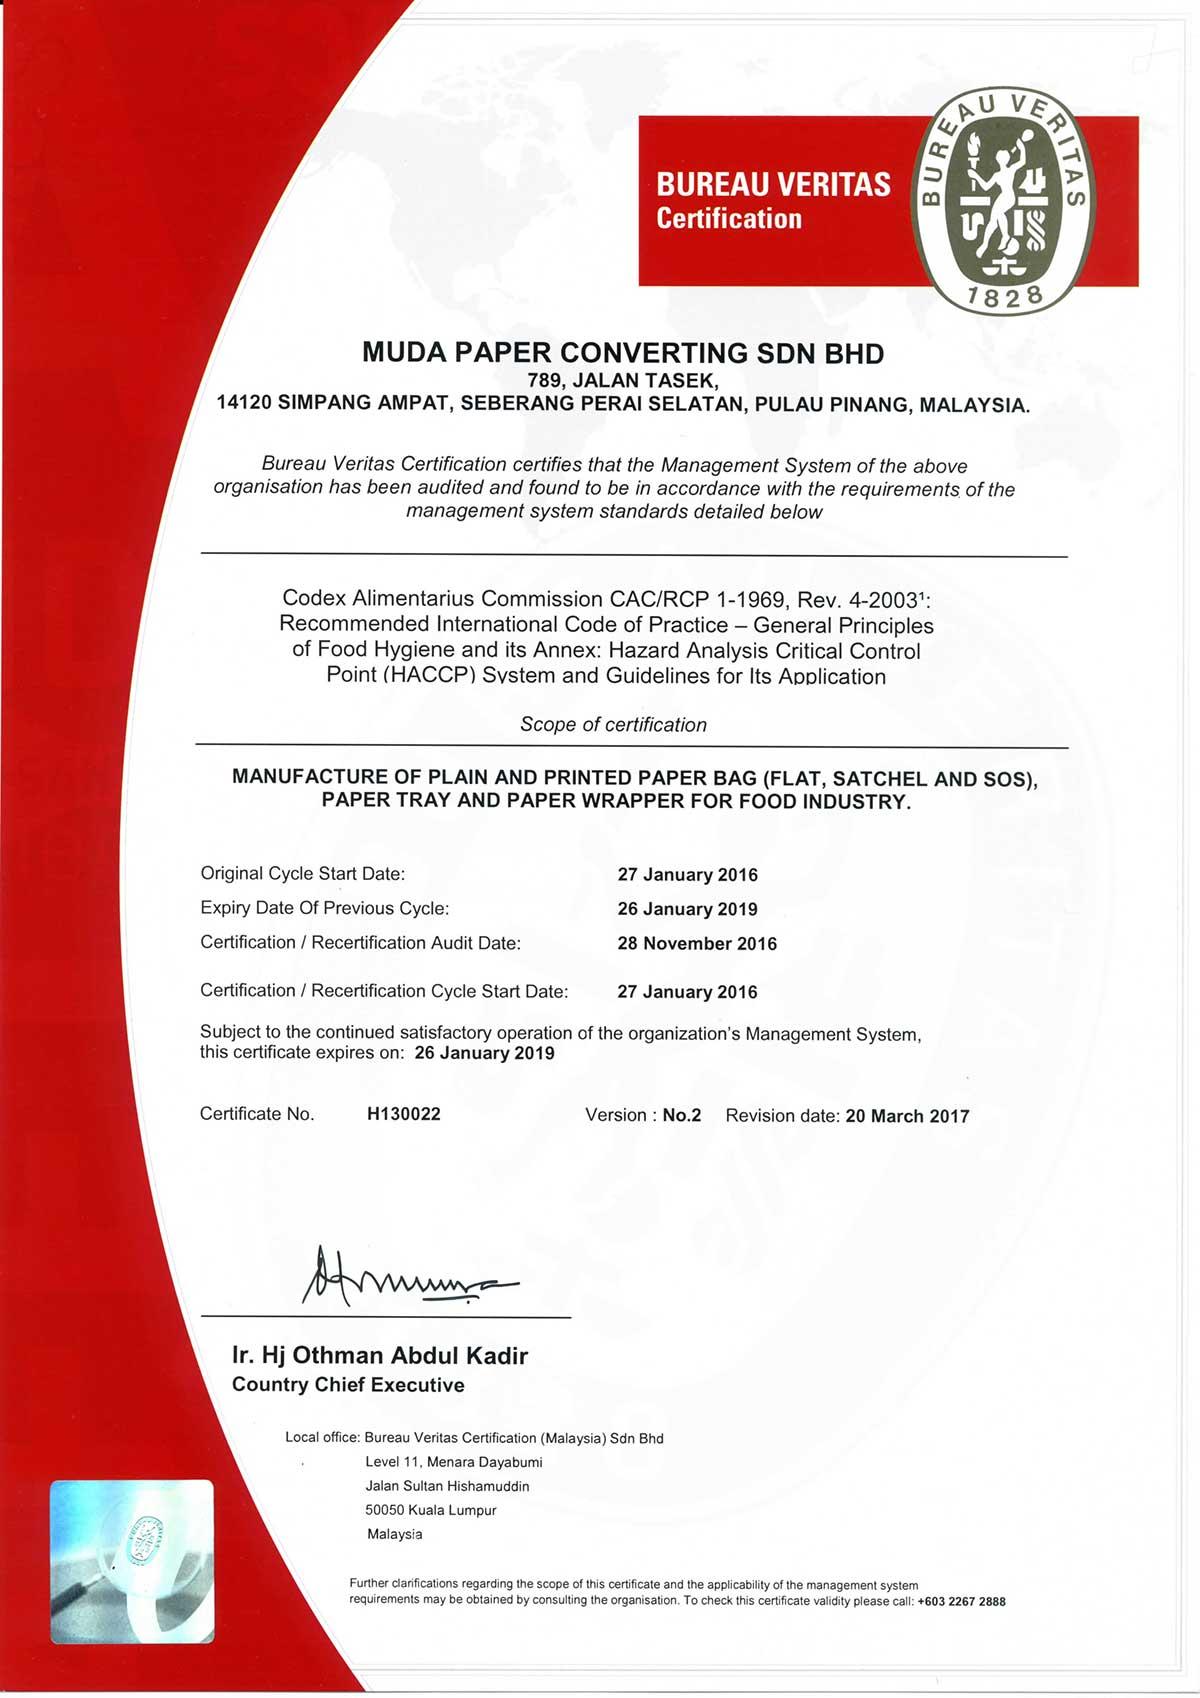 HACCP-Cert-Muda-Paper-Converting